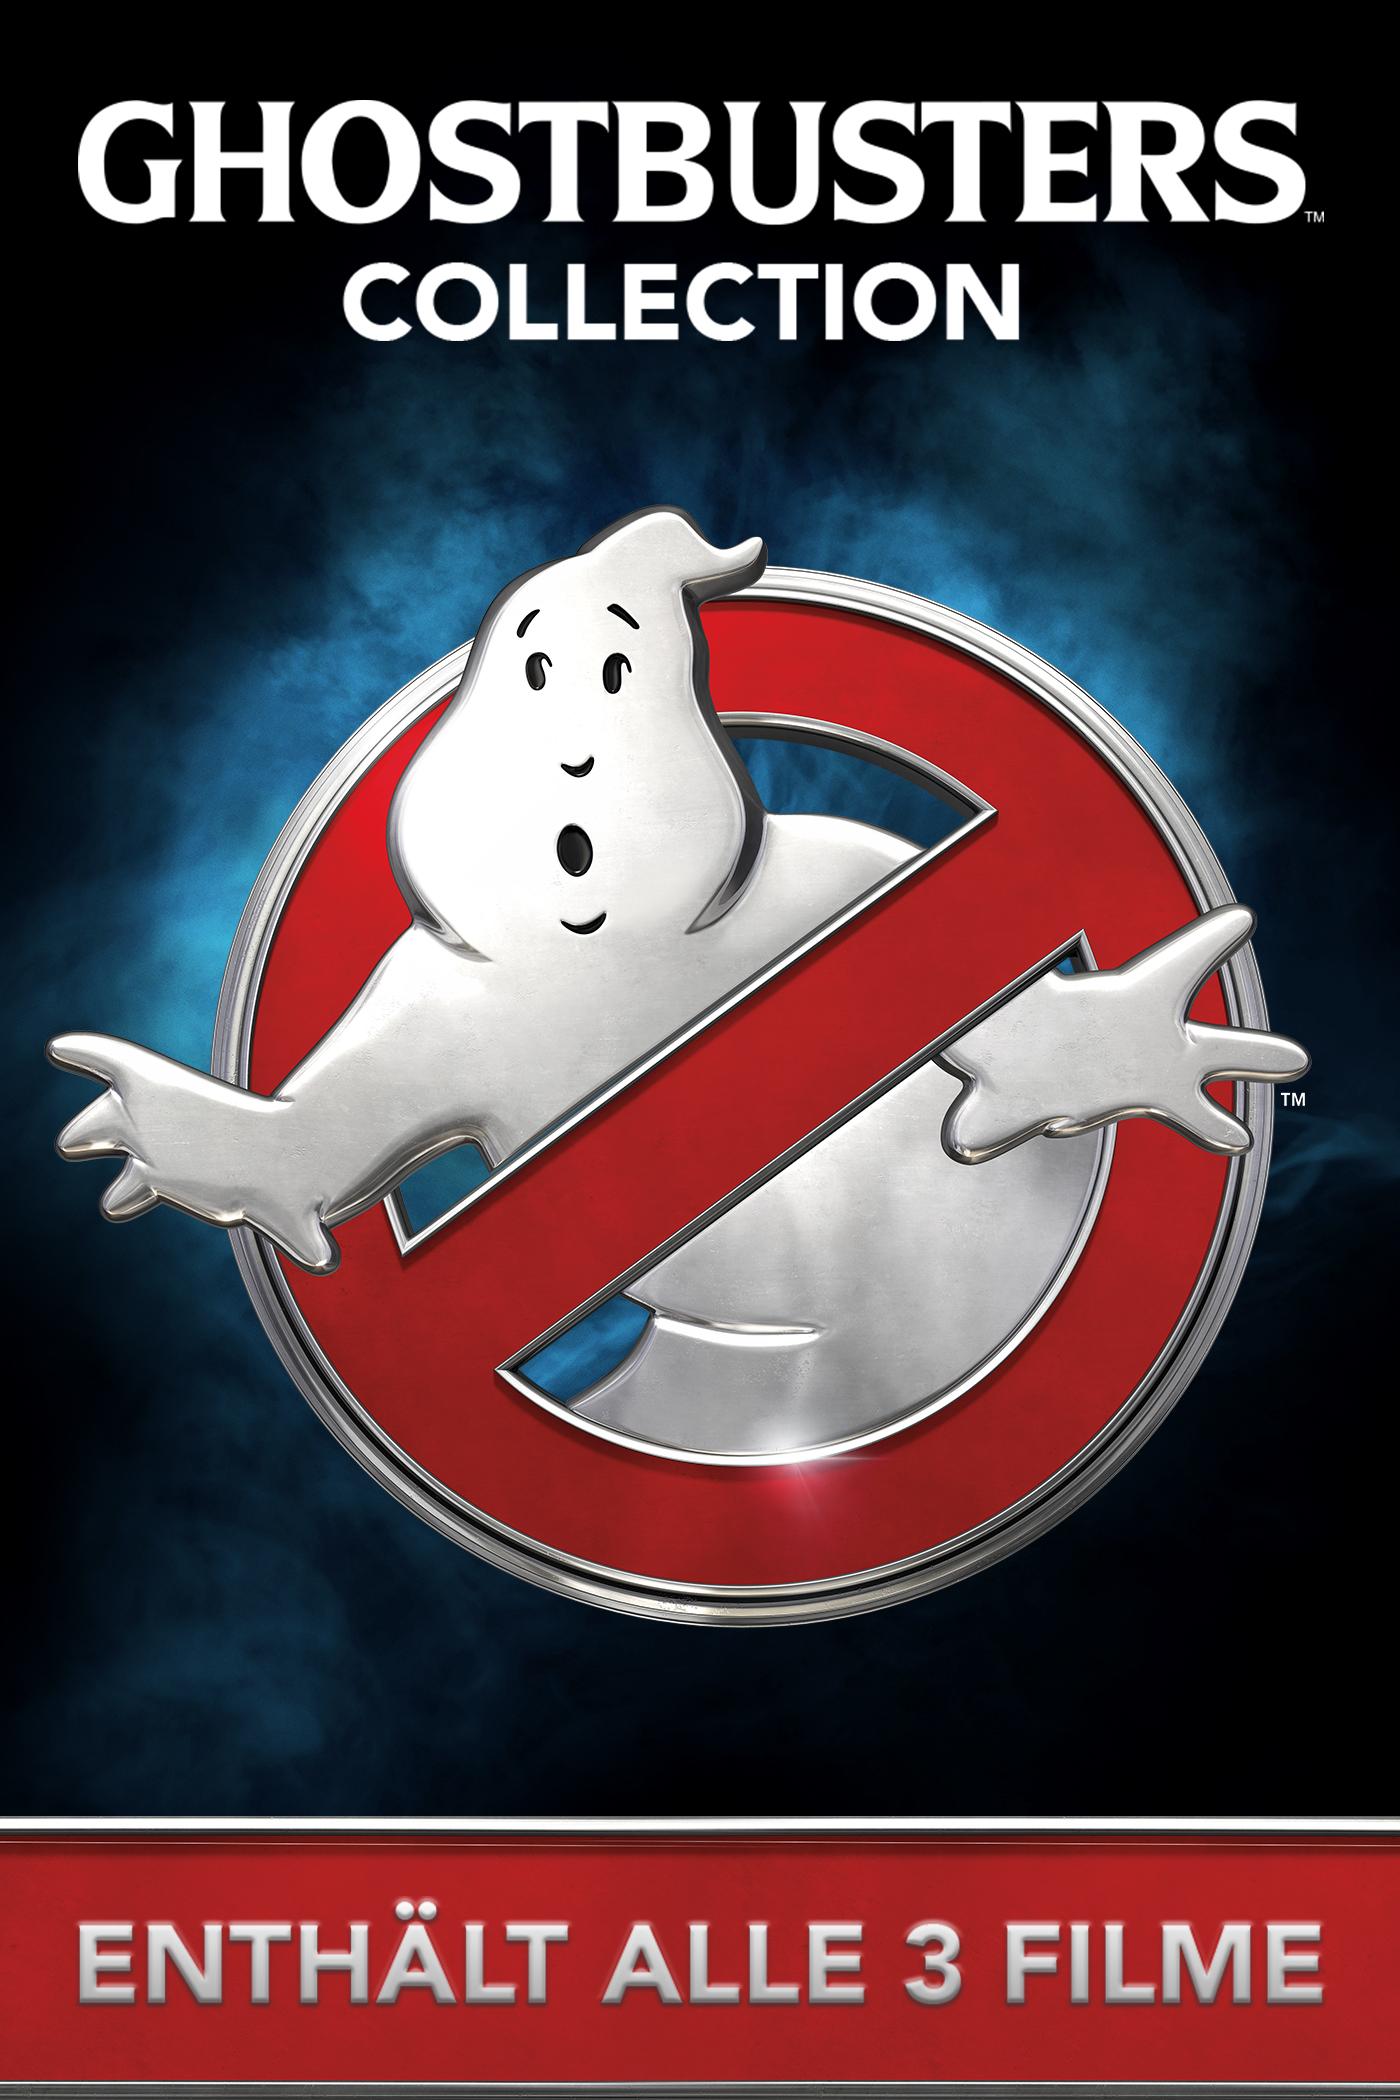 Ghostbusters Triple Feature stream